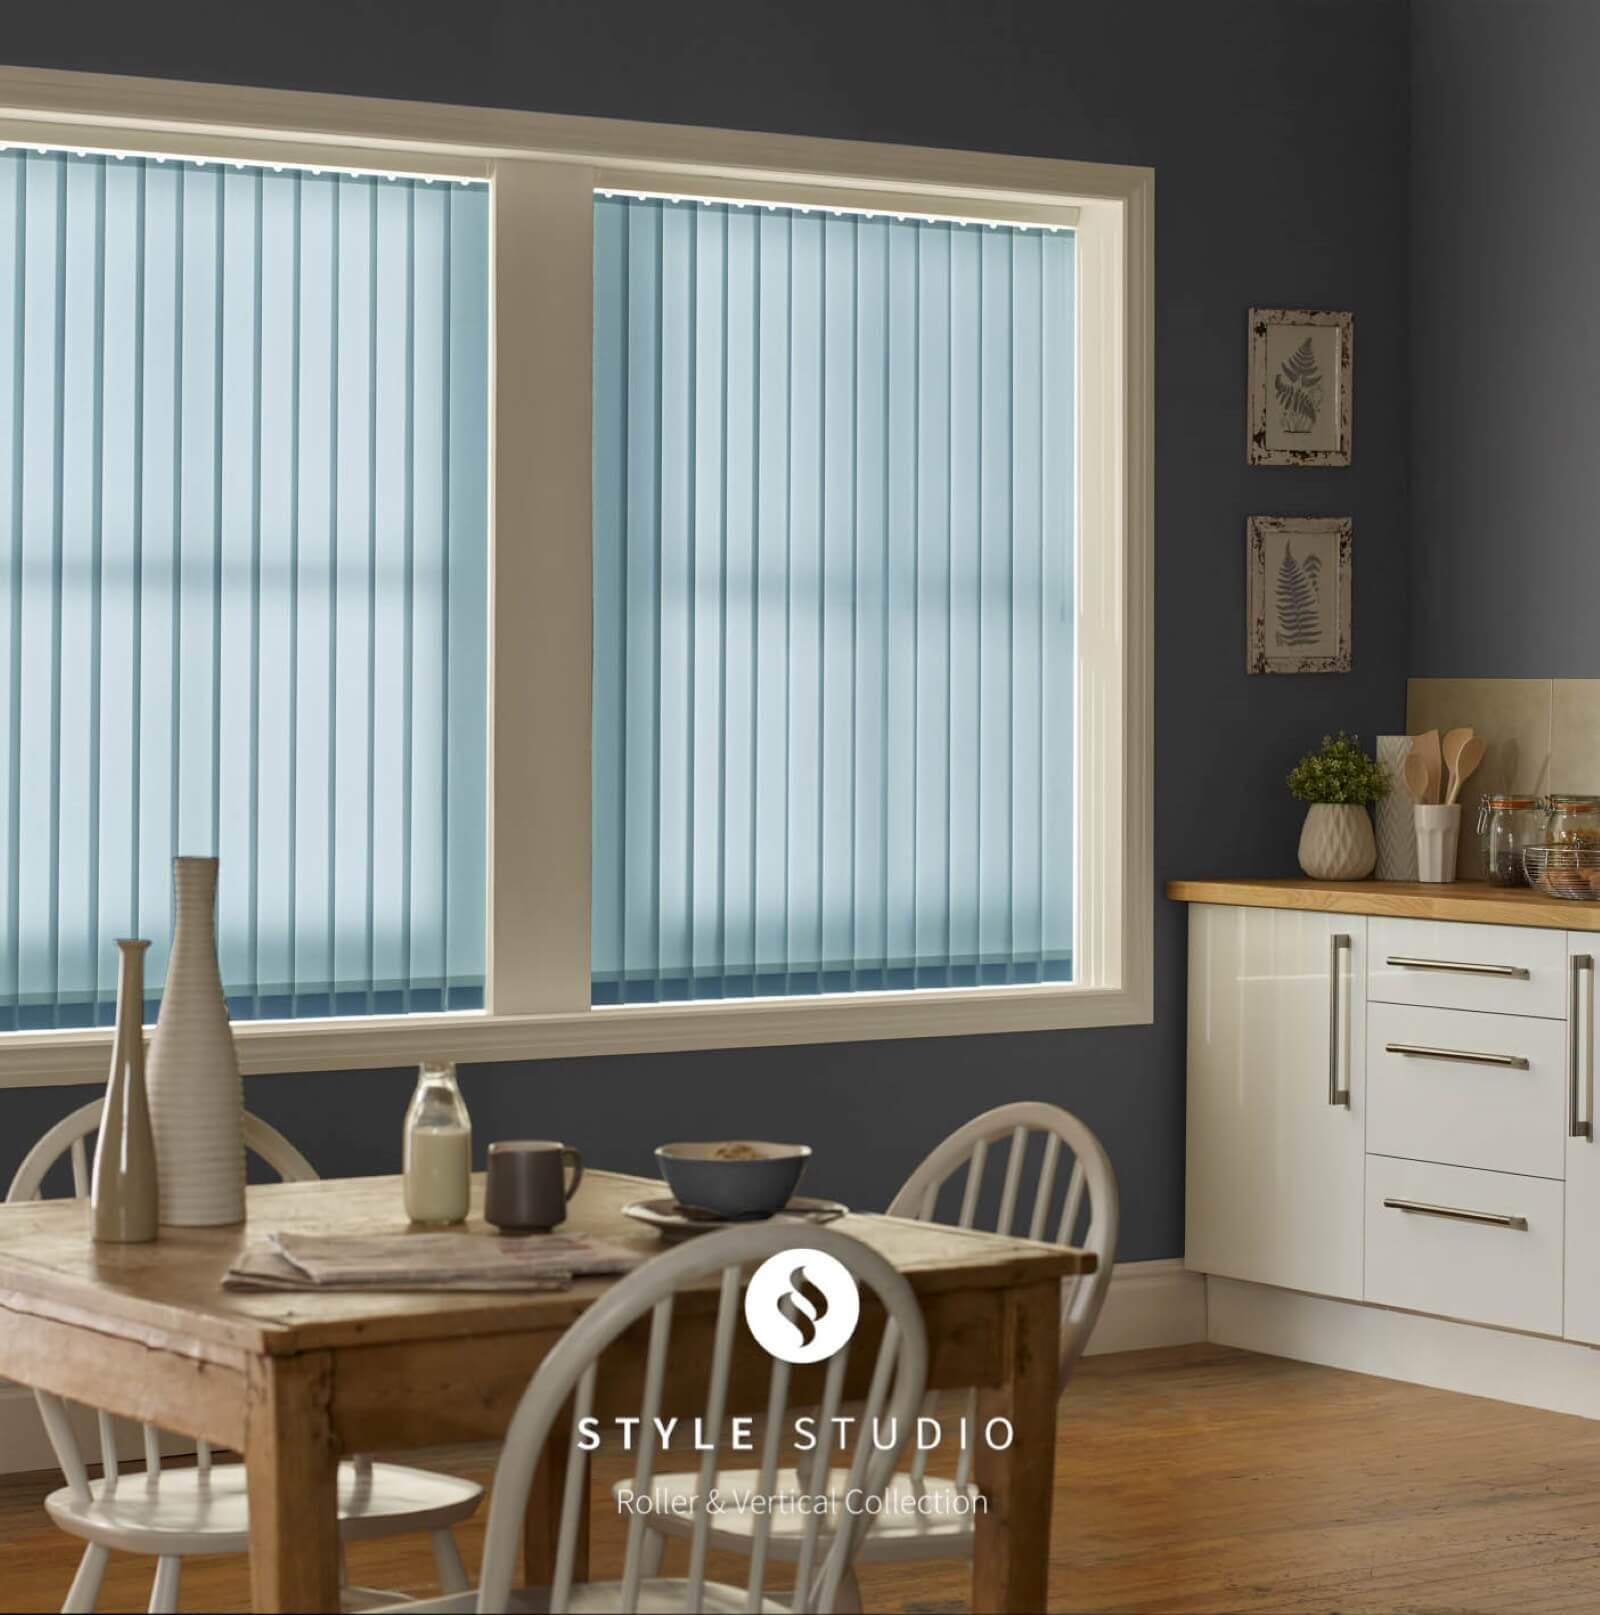 Supplying bespoke replacement blind slats | Devonshire Blinds